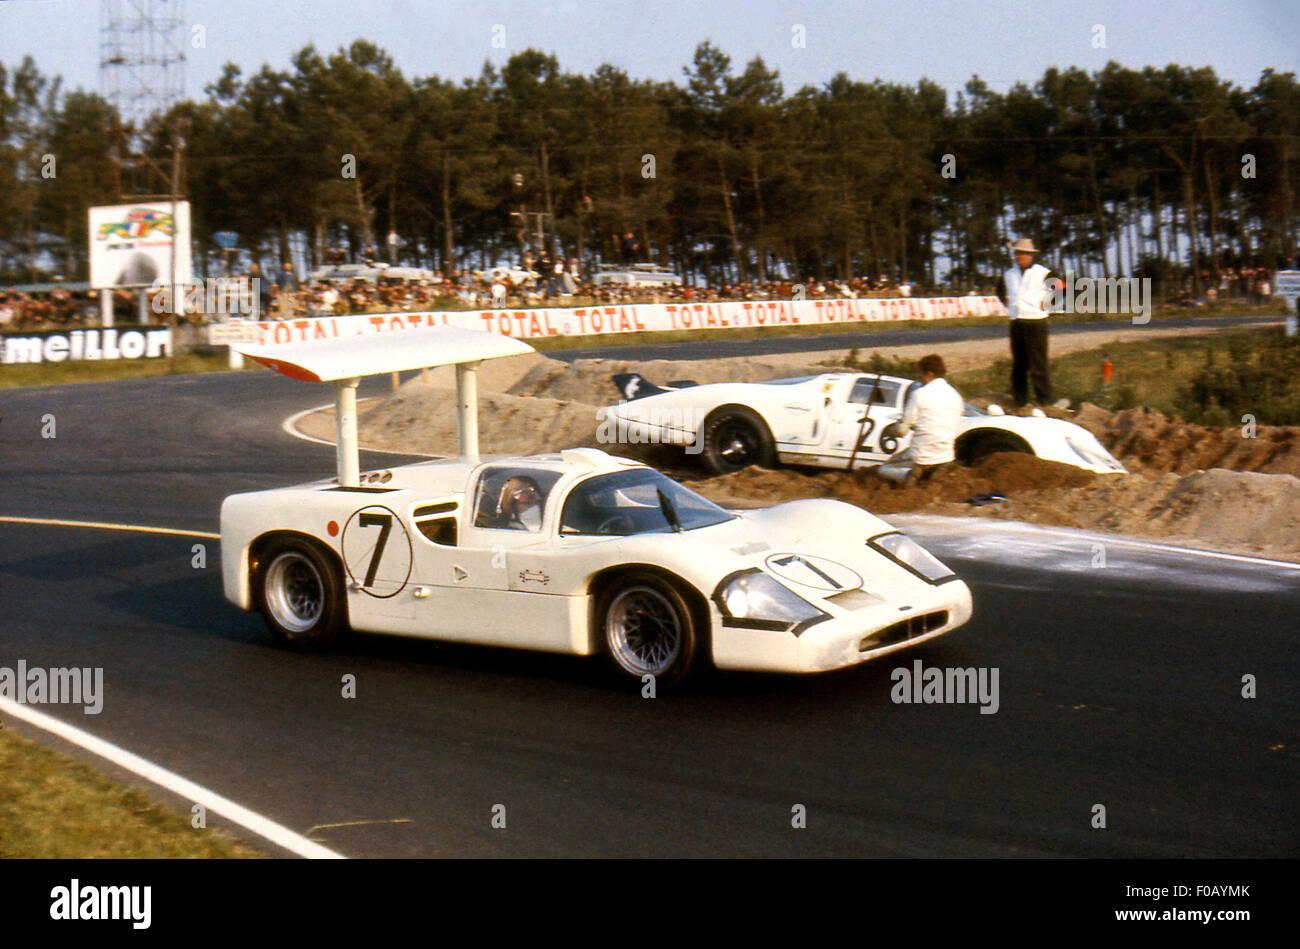 24-Stunden-Rennen von Le Mans 11. Juni 1967. Mike Spence, Phil Hill Chaparral 2F. Stockbild